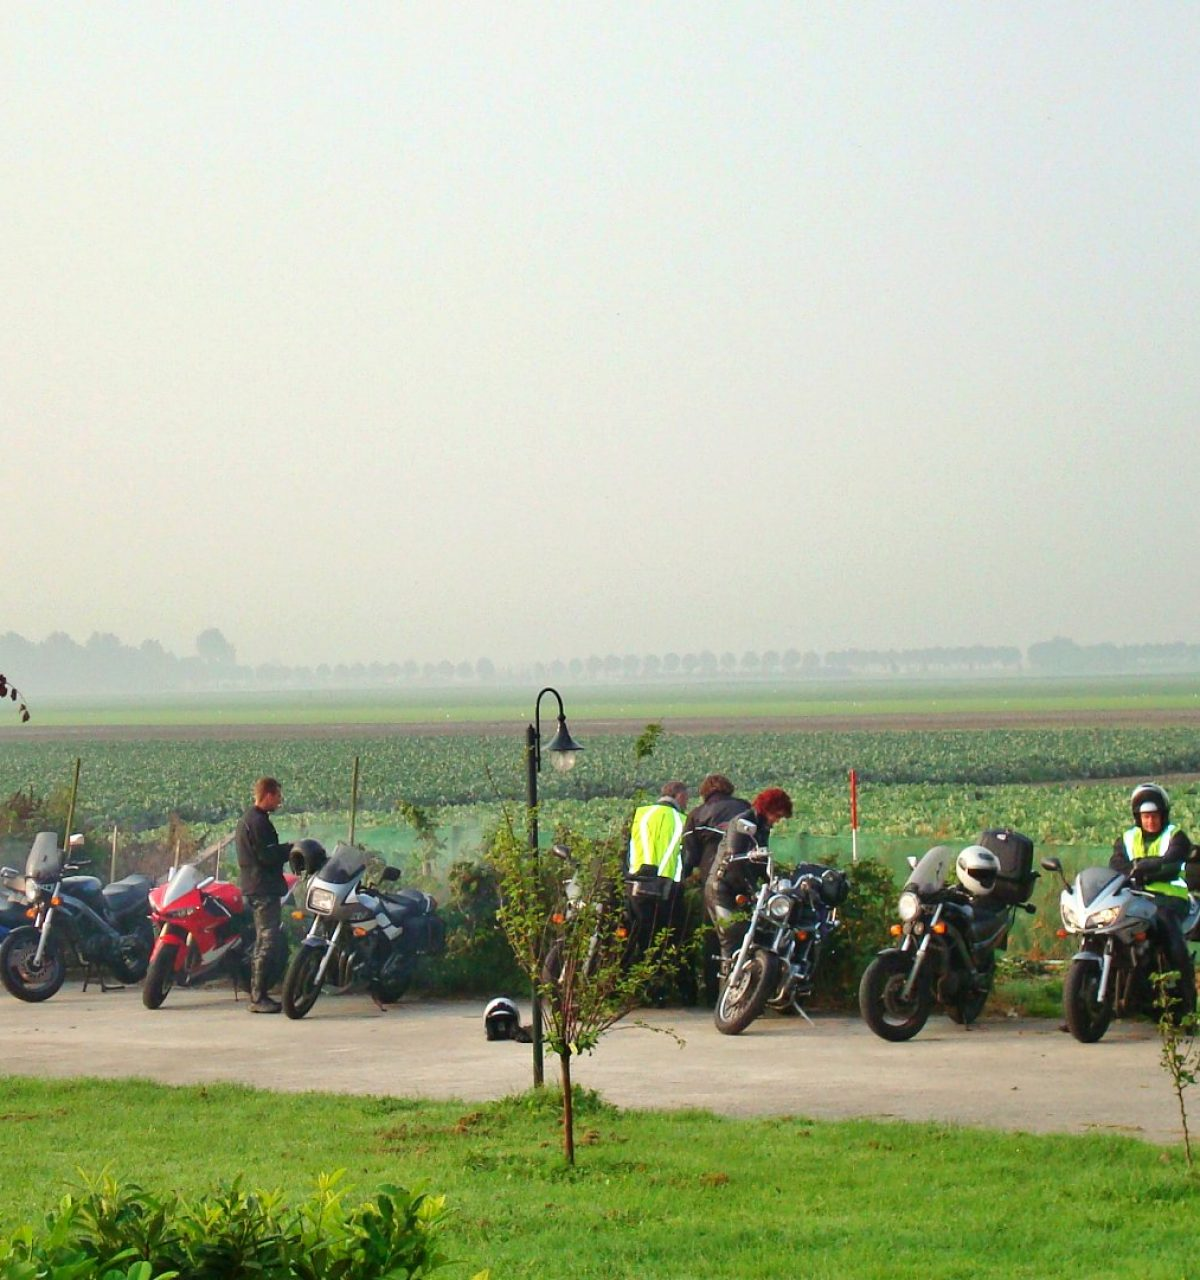 motorvakantie in noord holland bedandbreakfast lanormande hoorn-01